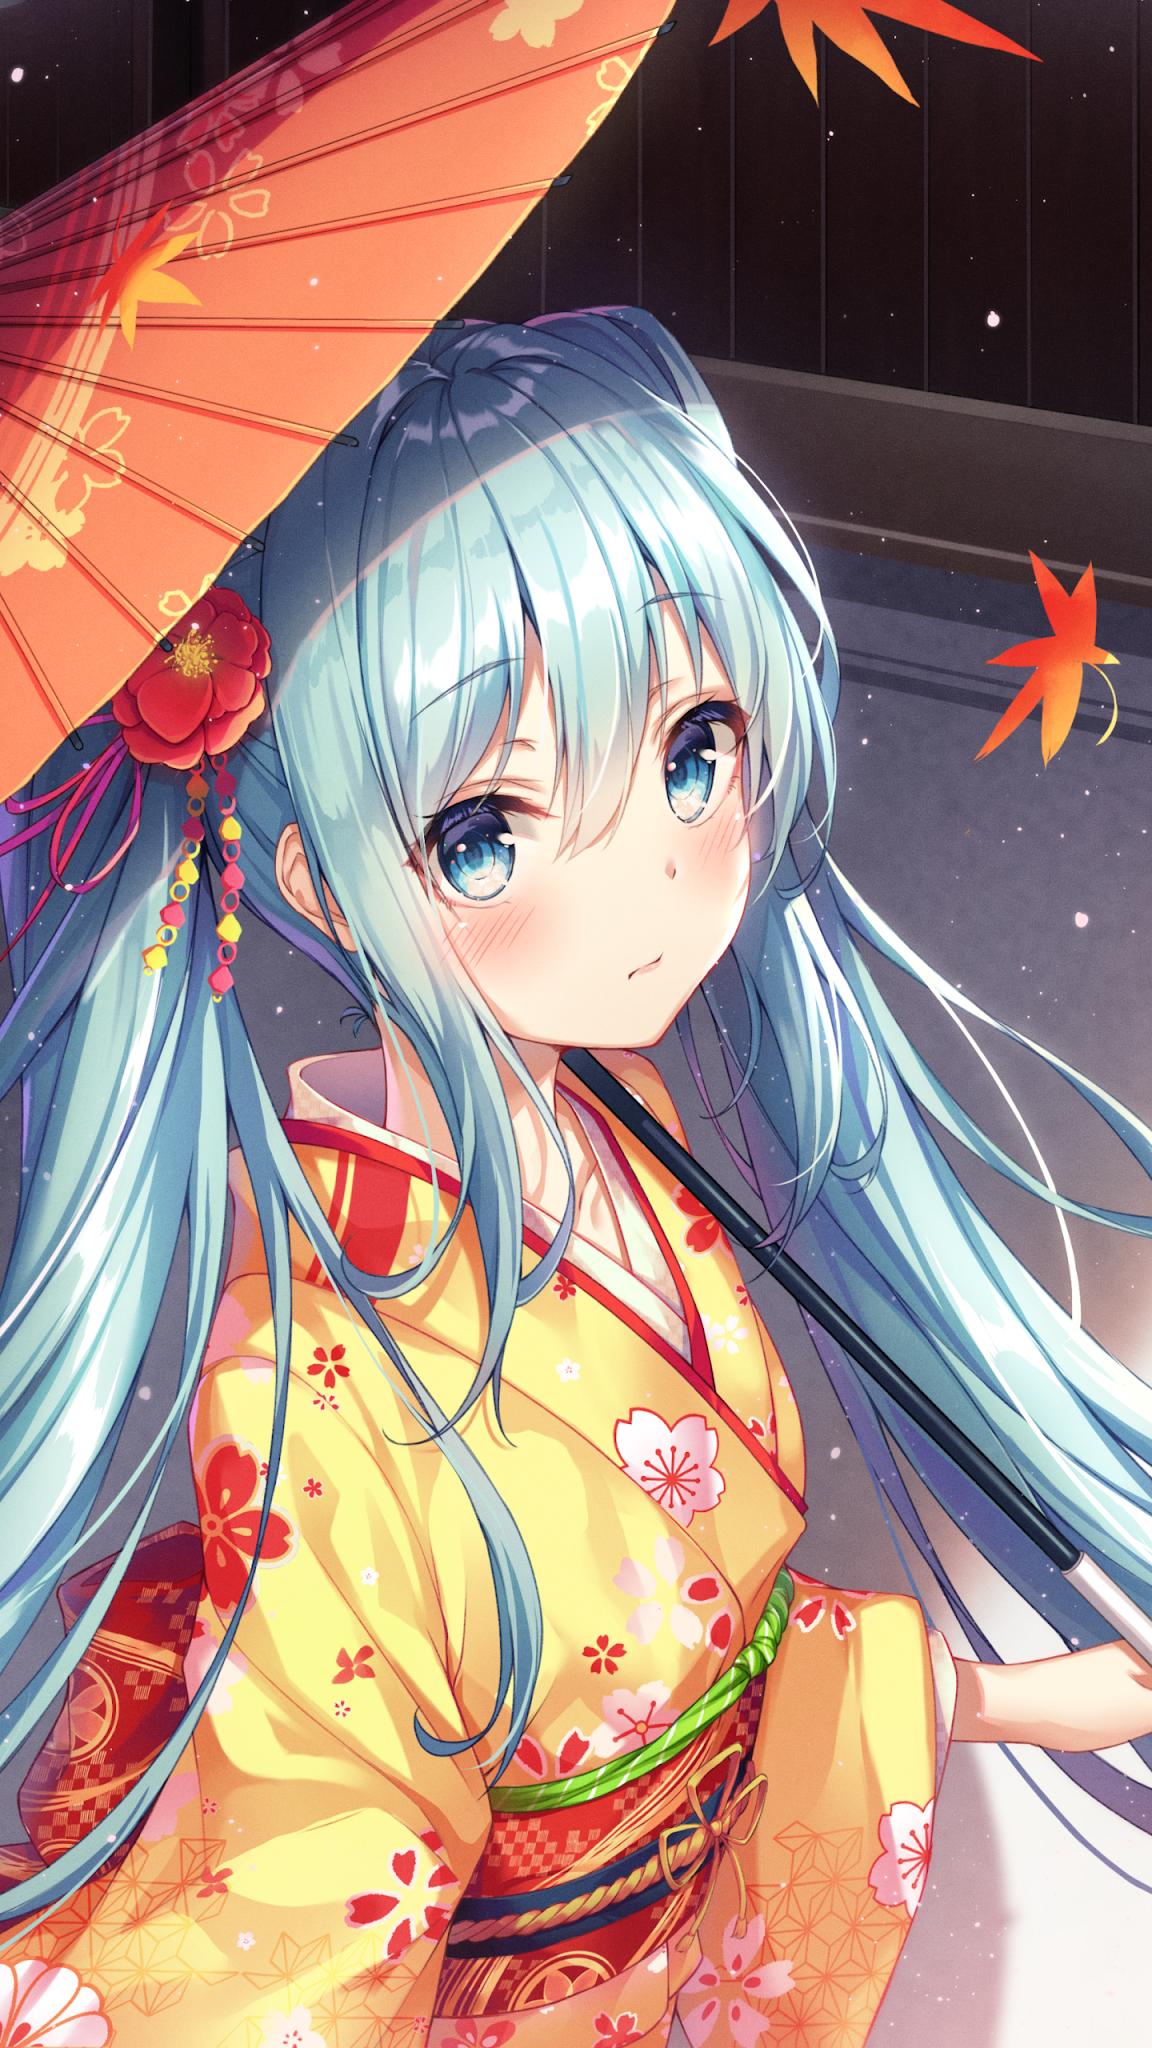 Hatsune Miku Anime Mobile Wallpaper Vocaloid Anime Wallpaper Iphone Anime Mobile Anime Wallpaper